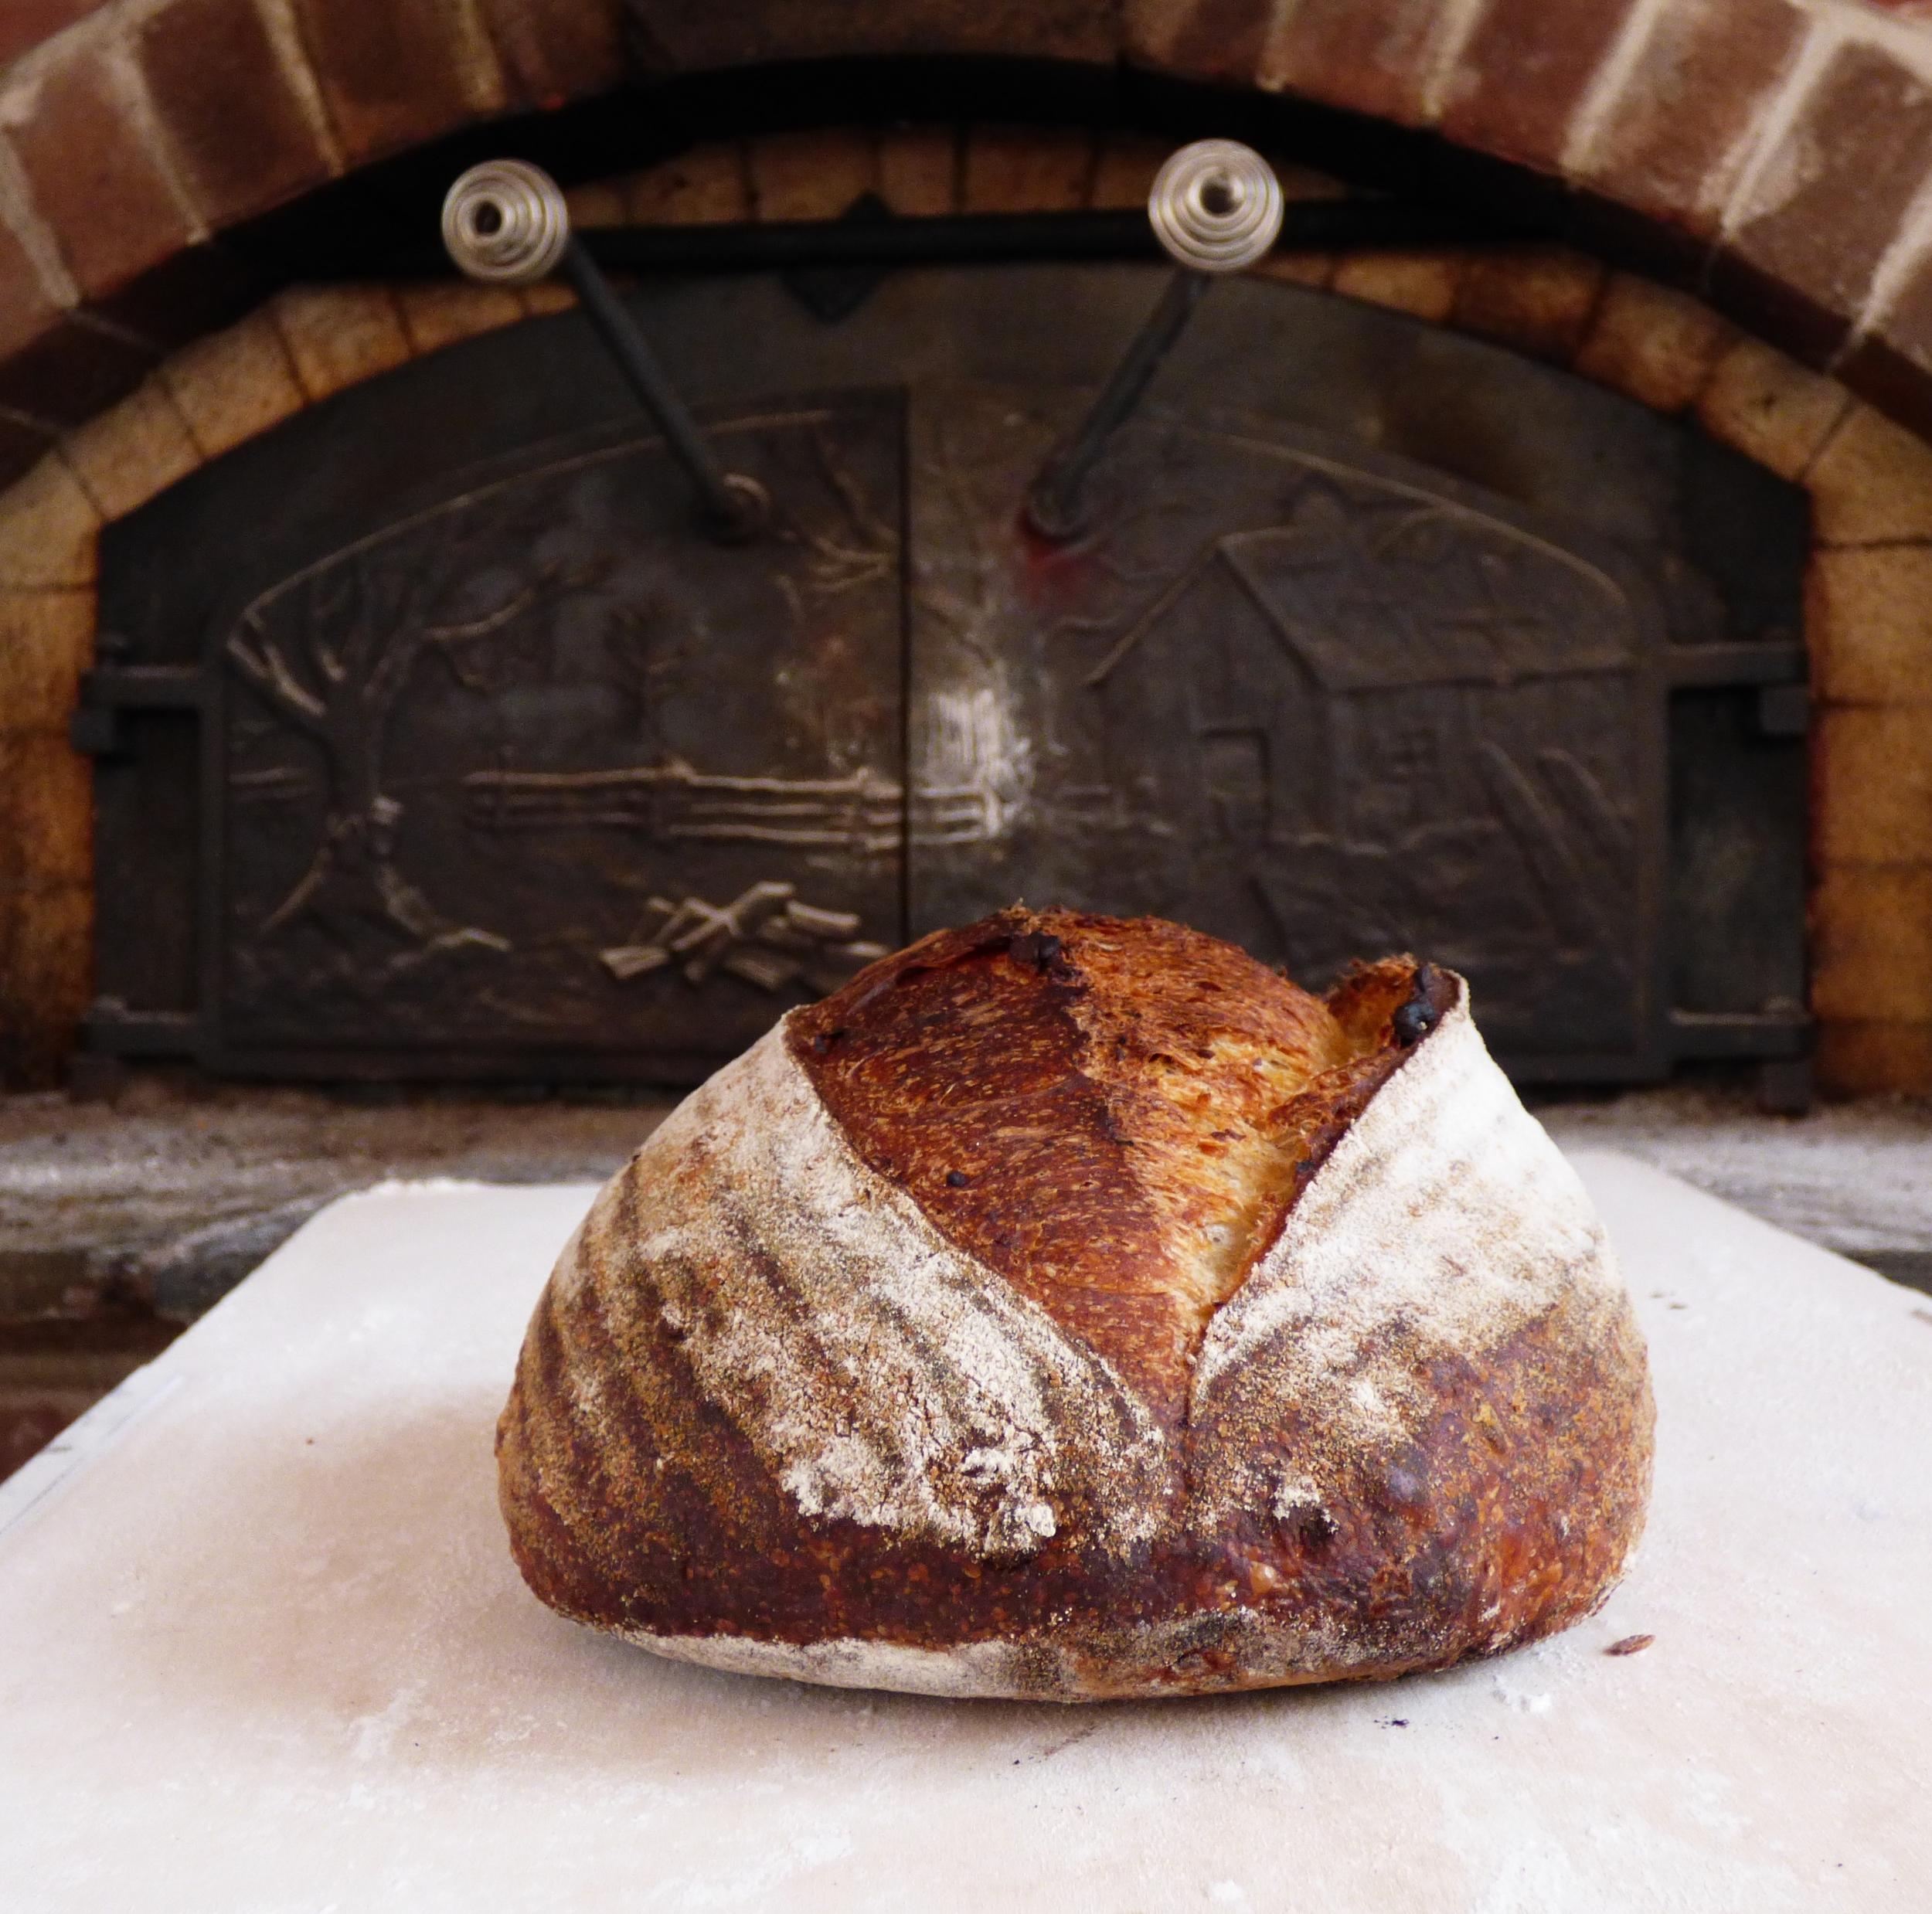 St Paddy's Badaydas - Roasted Potato Bread